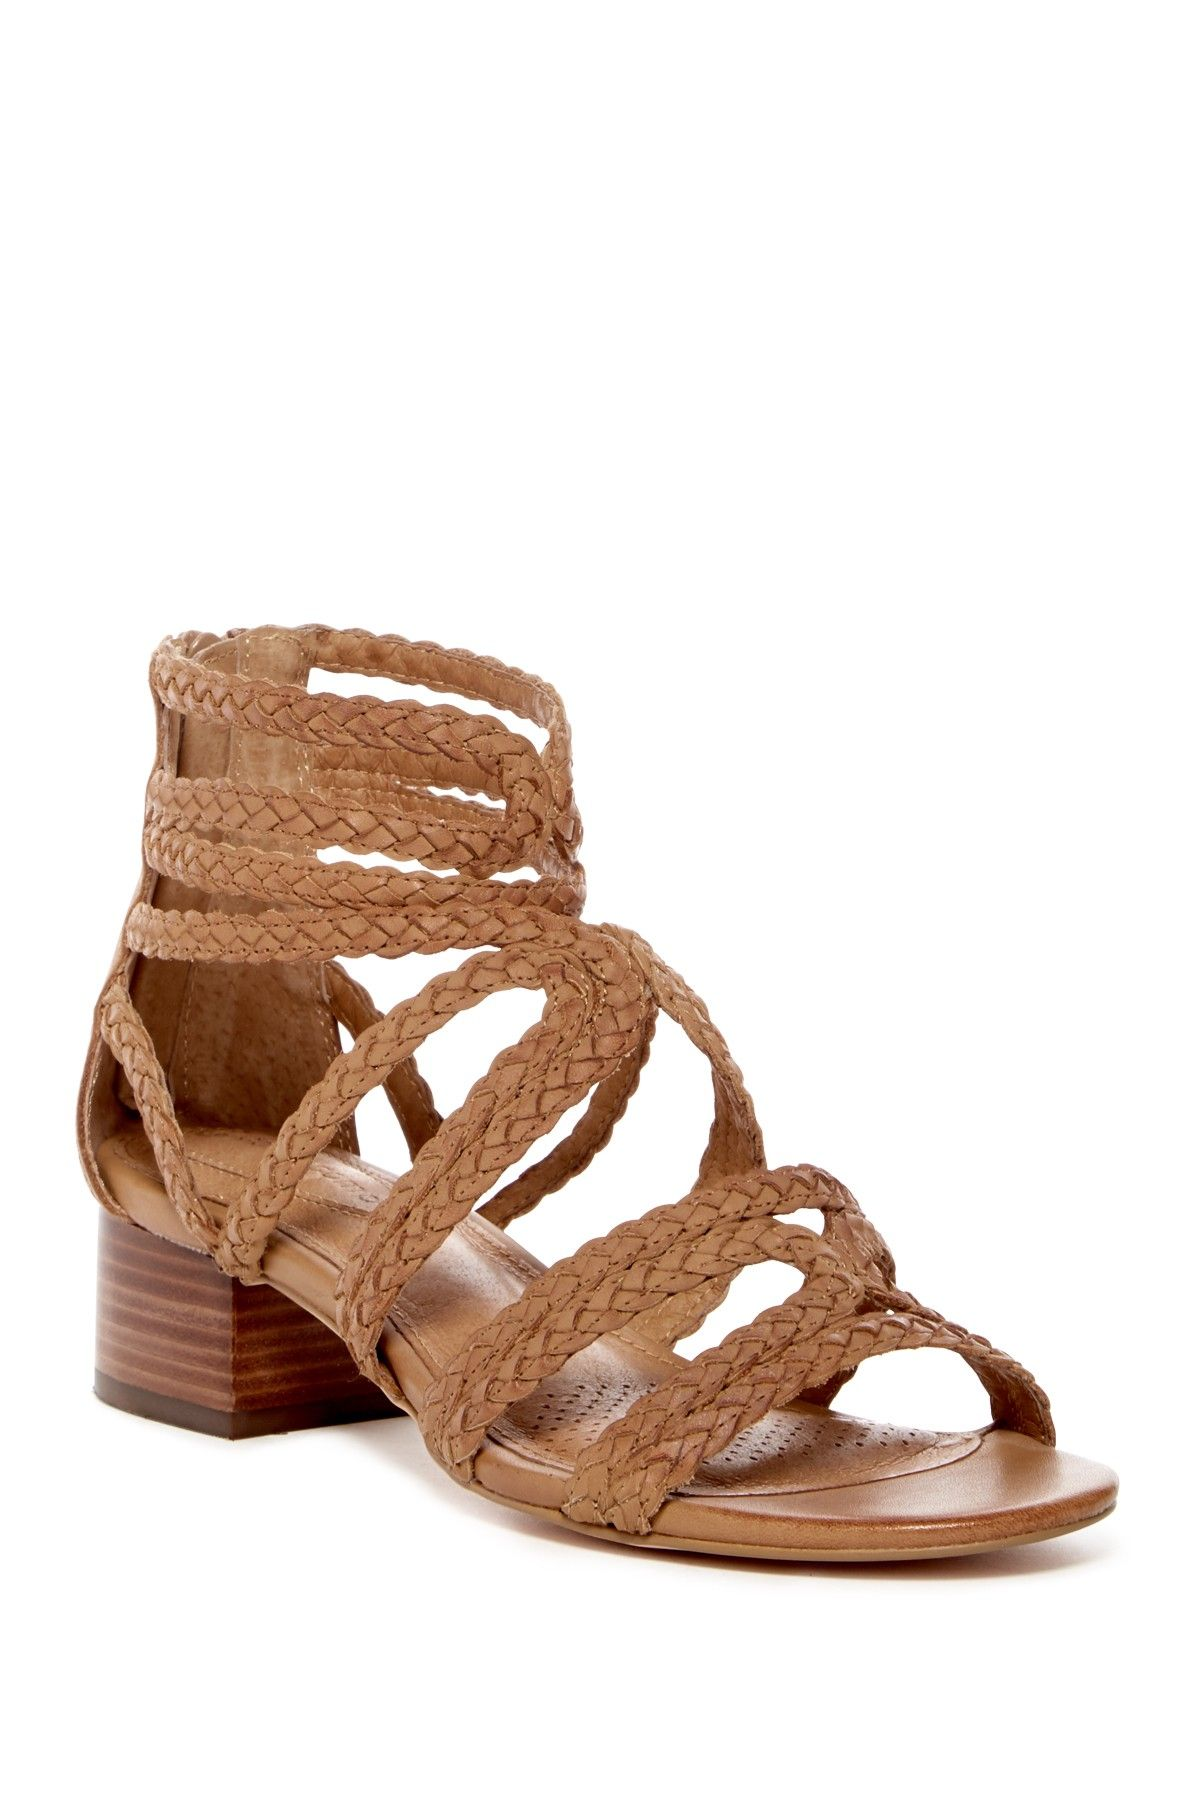 Corso Como Jonah Braided Sandal Braided sandals, Women